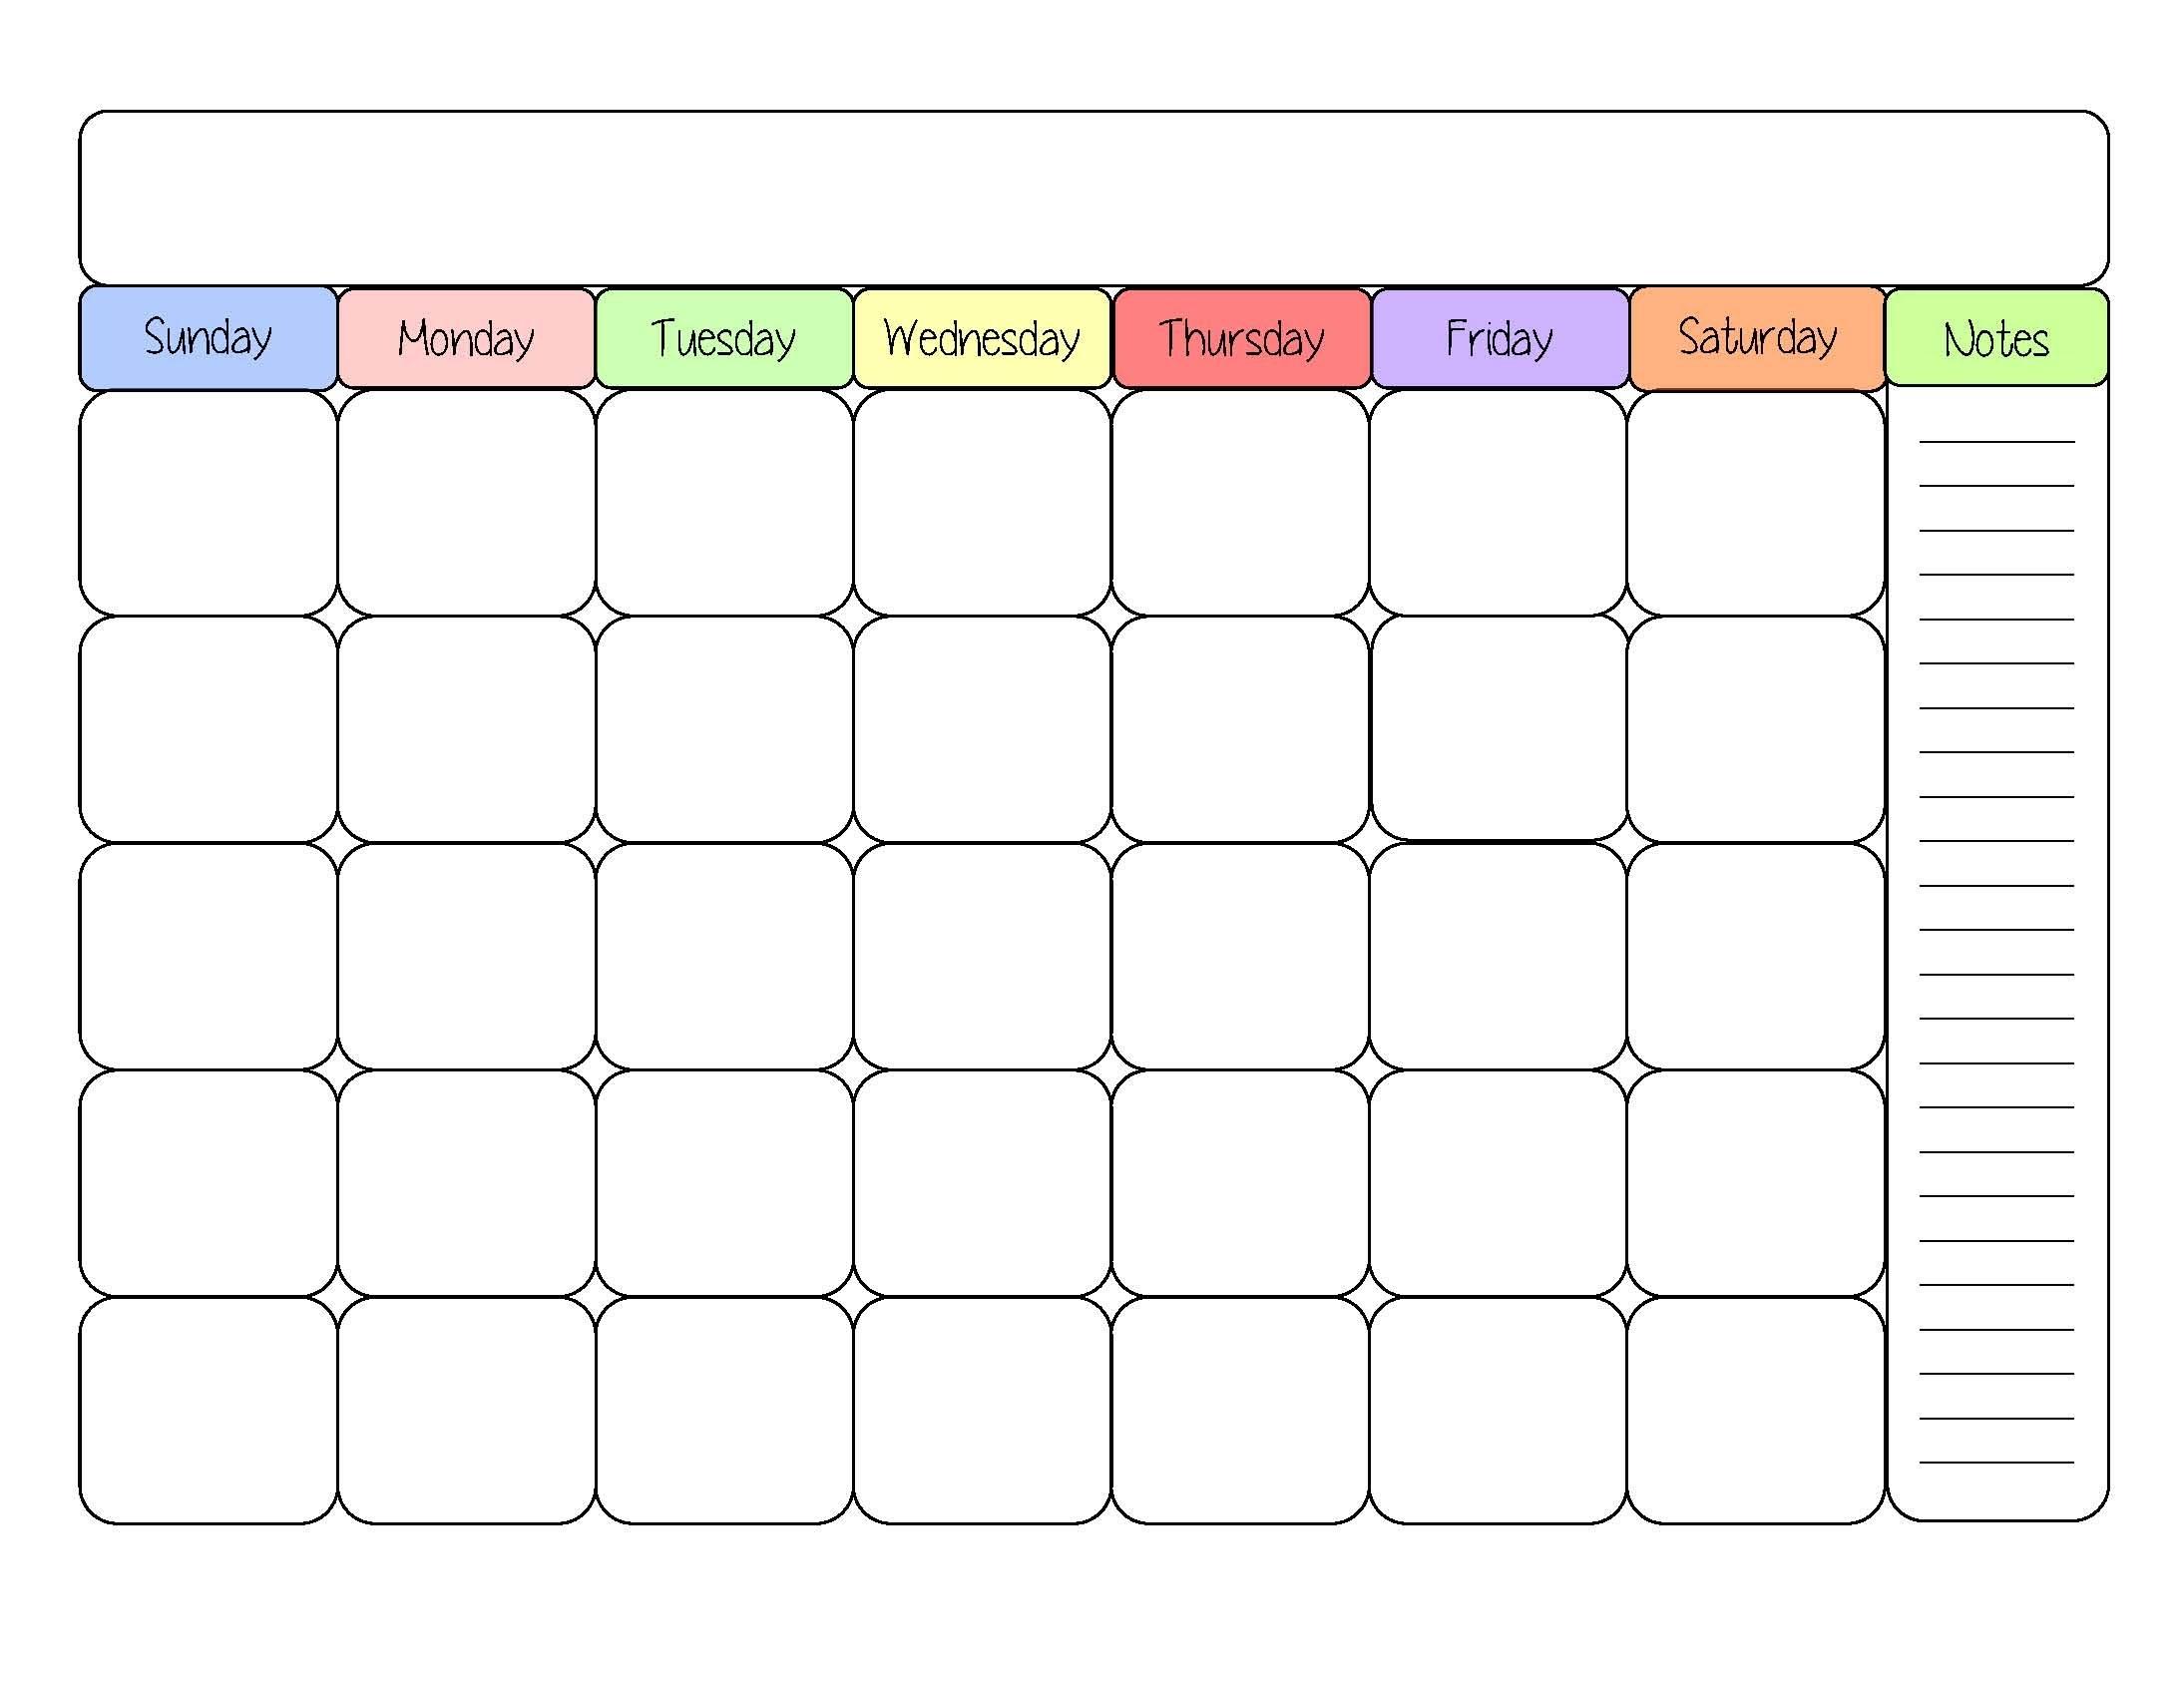 Free Printable Calendar Template Simply Sweet Days  Fill In Calendar Template Printable